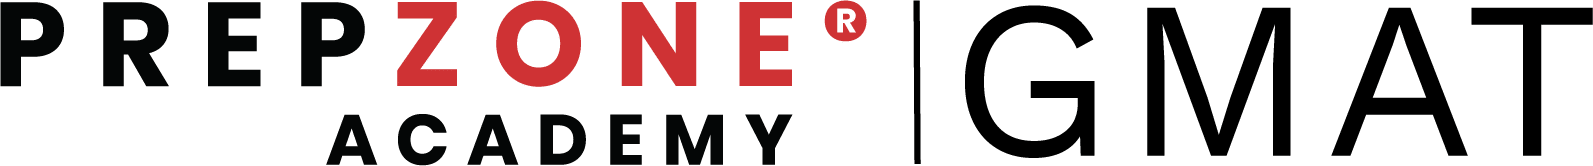 Prep Zone Academy | GMAT